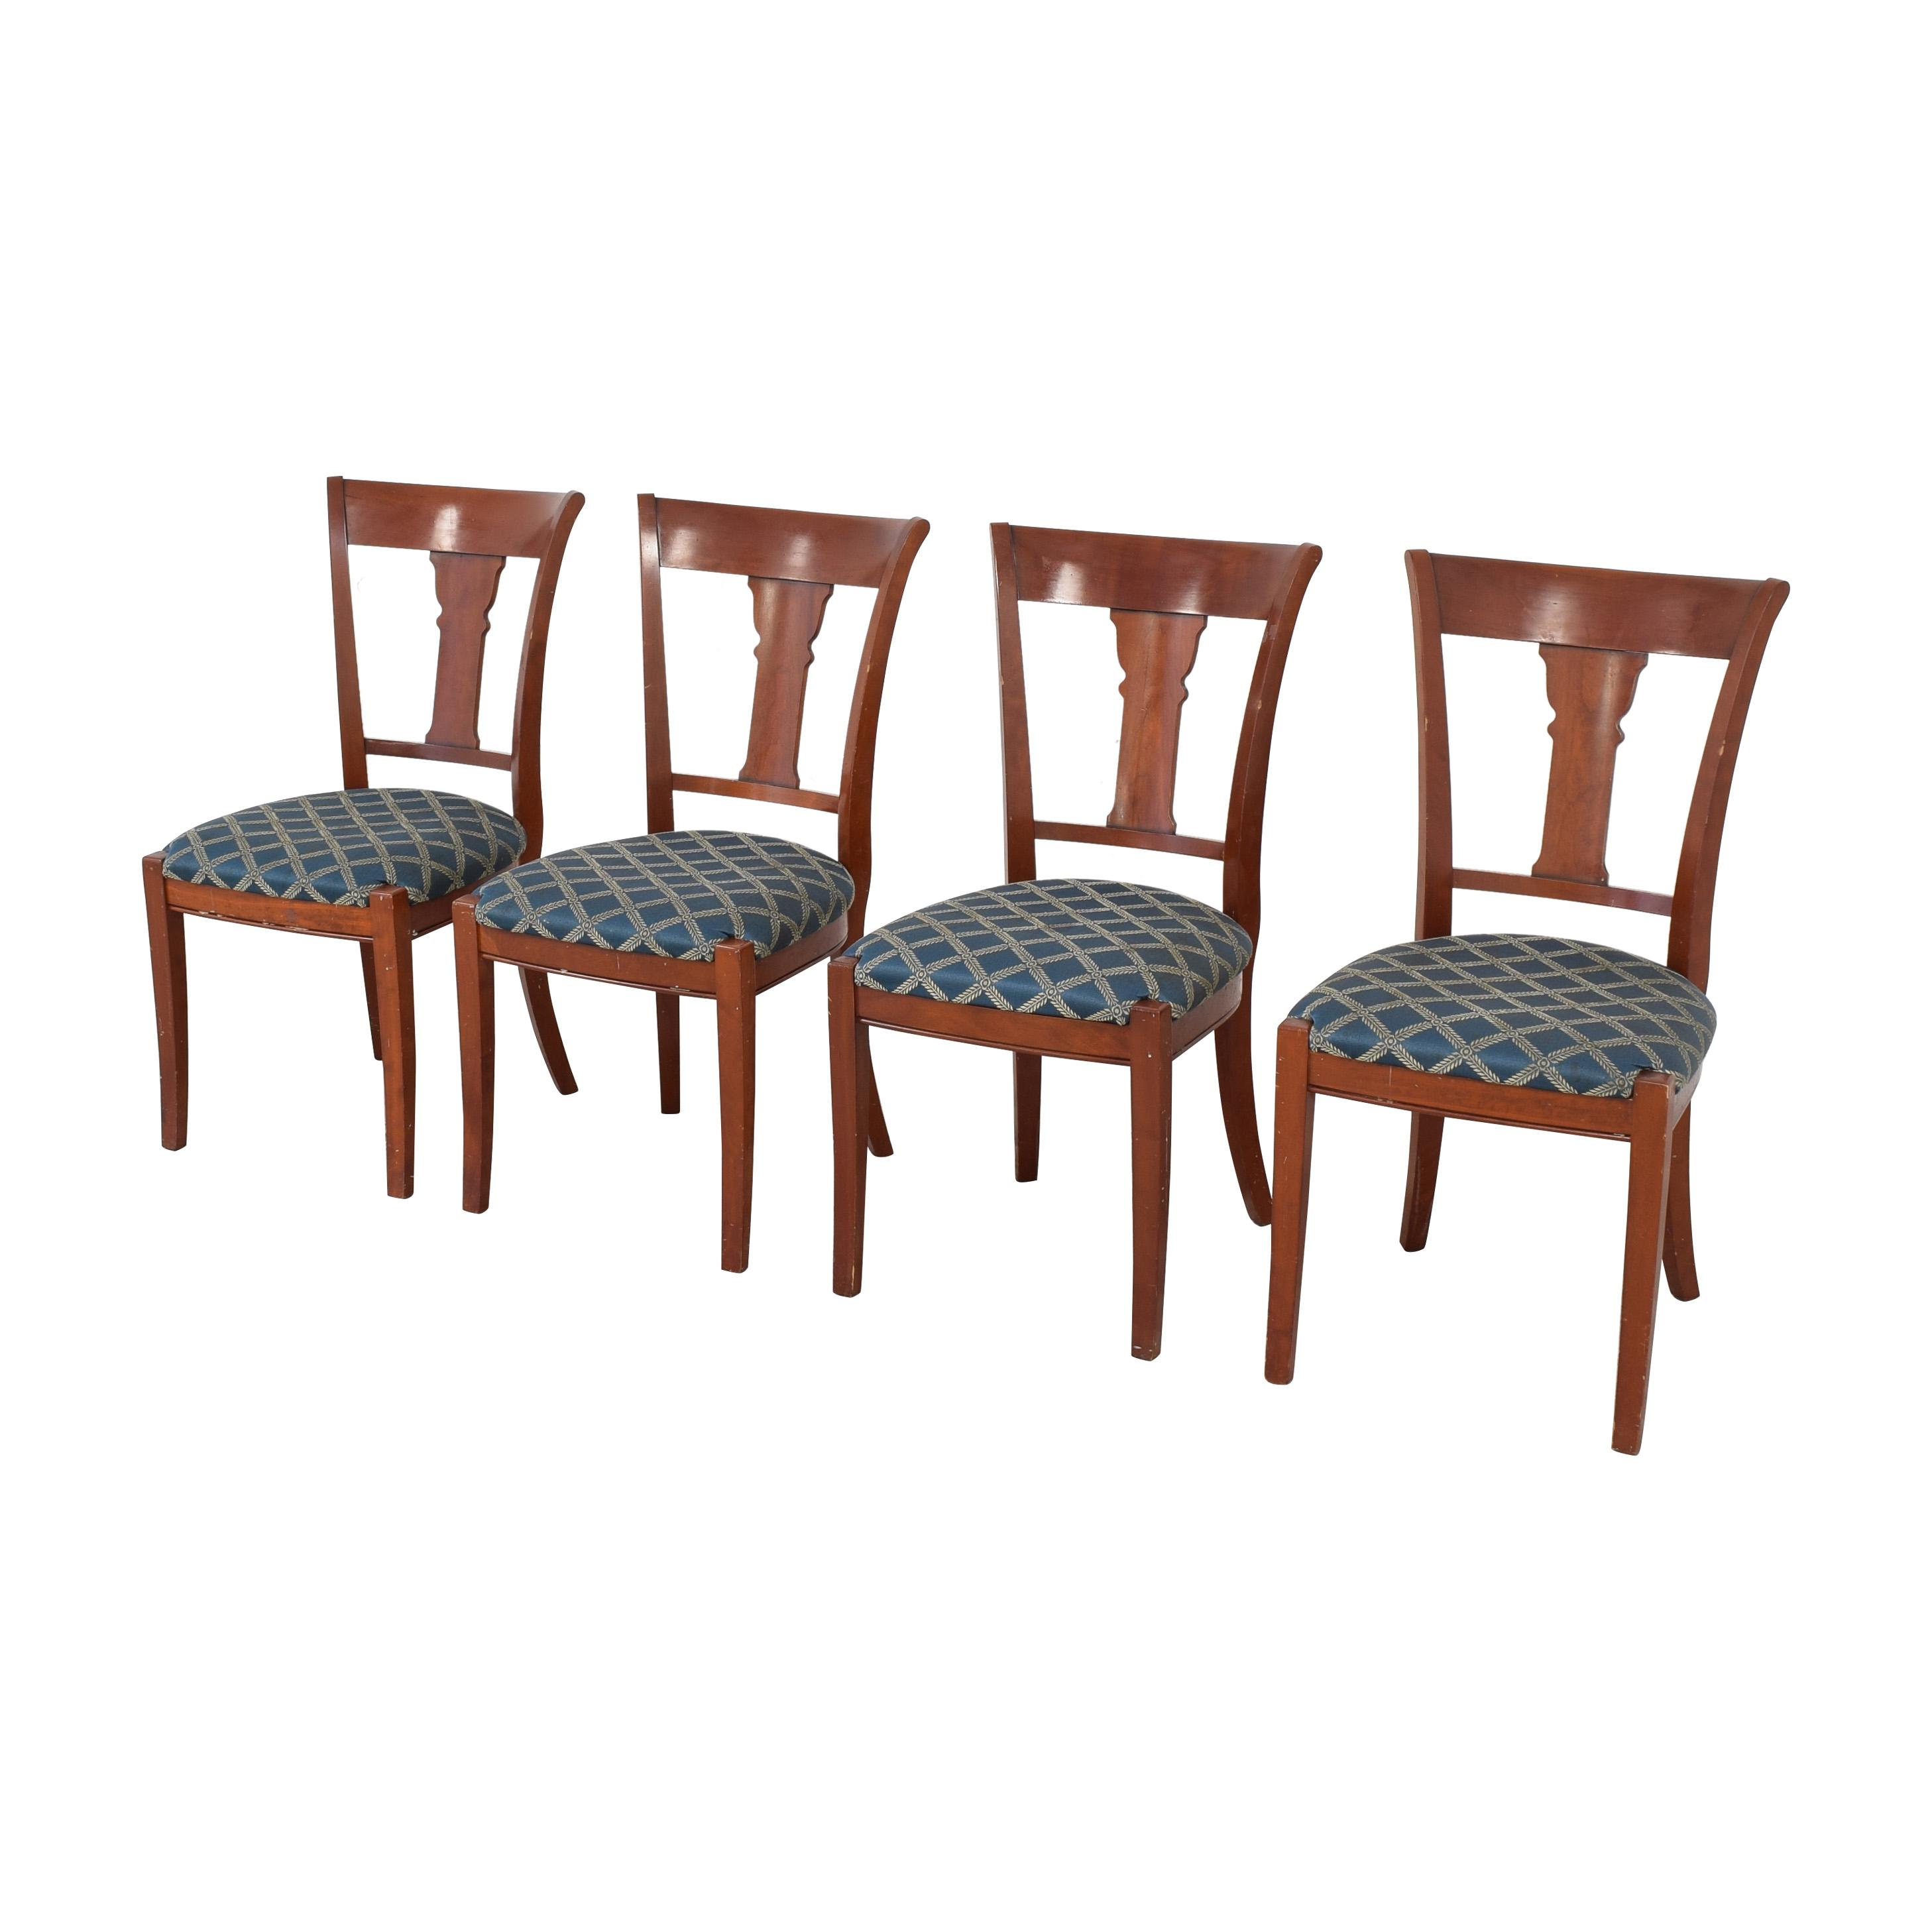 Grange Rochambeau Dining Chairs / Chairs